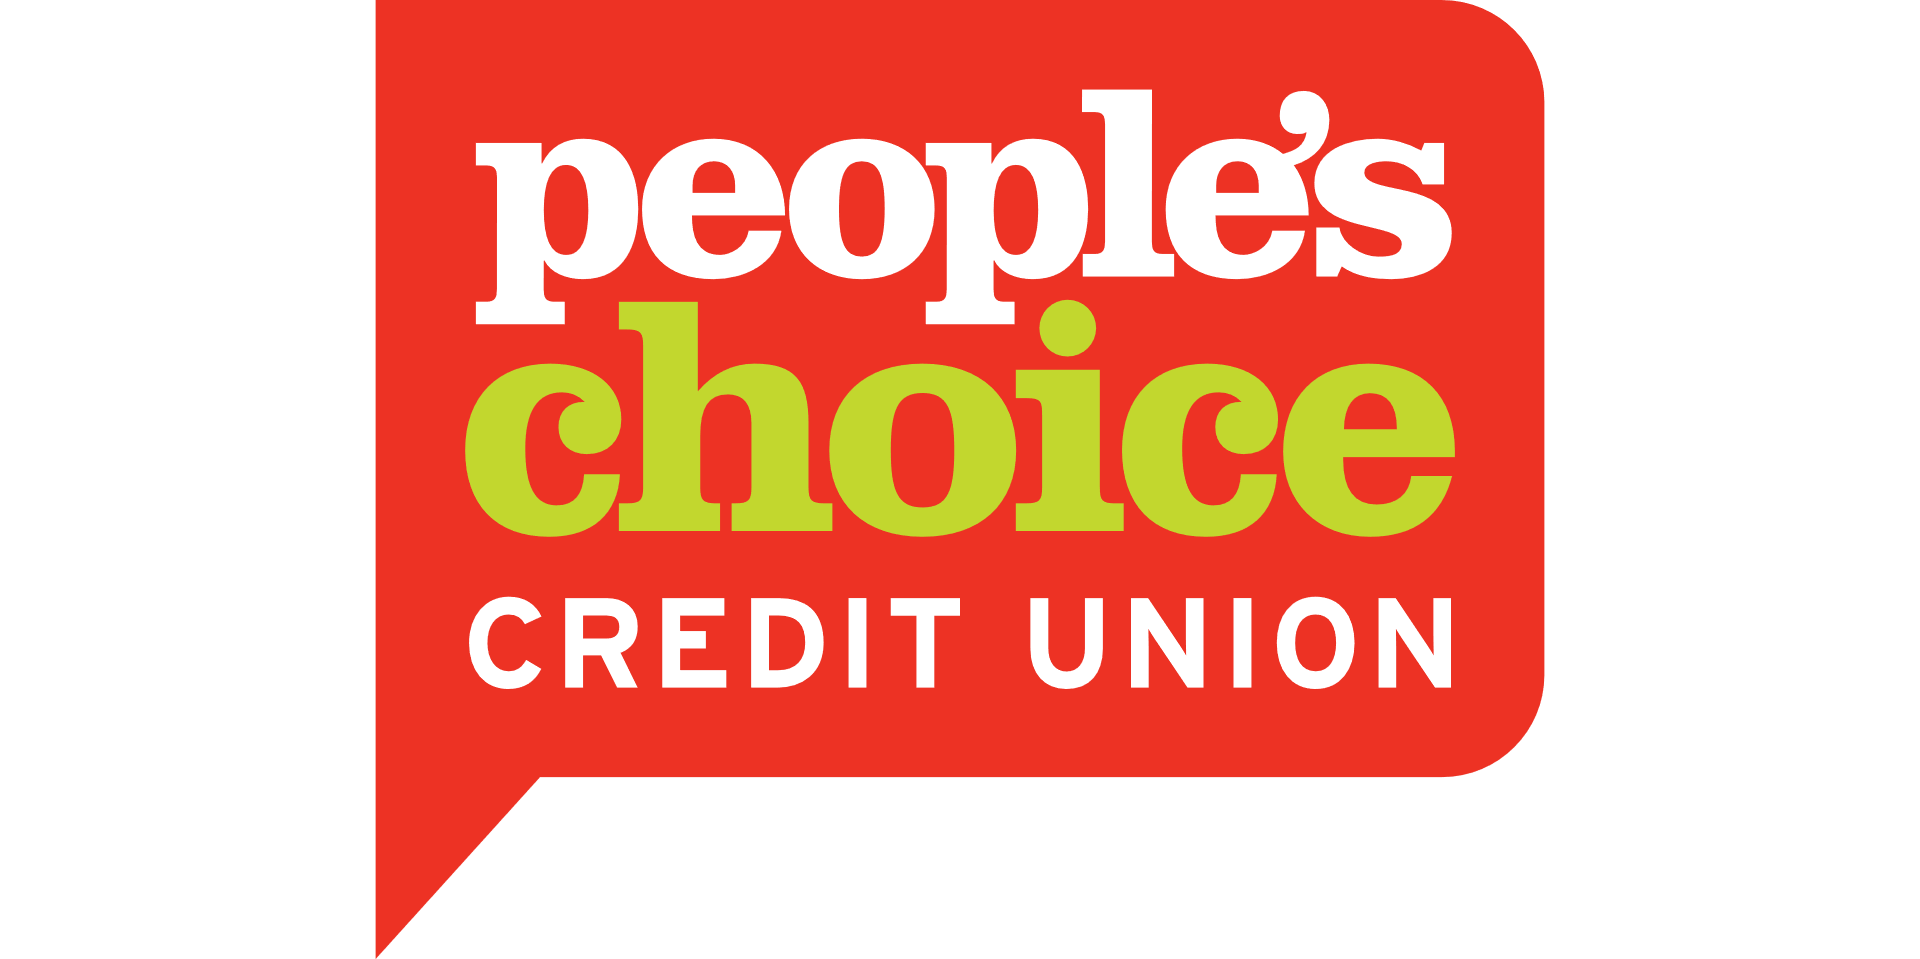 People's Choice Credit Union - Prospect, SA 5082 - (01) 3118 1182 | ShowMeLocal.com